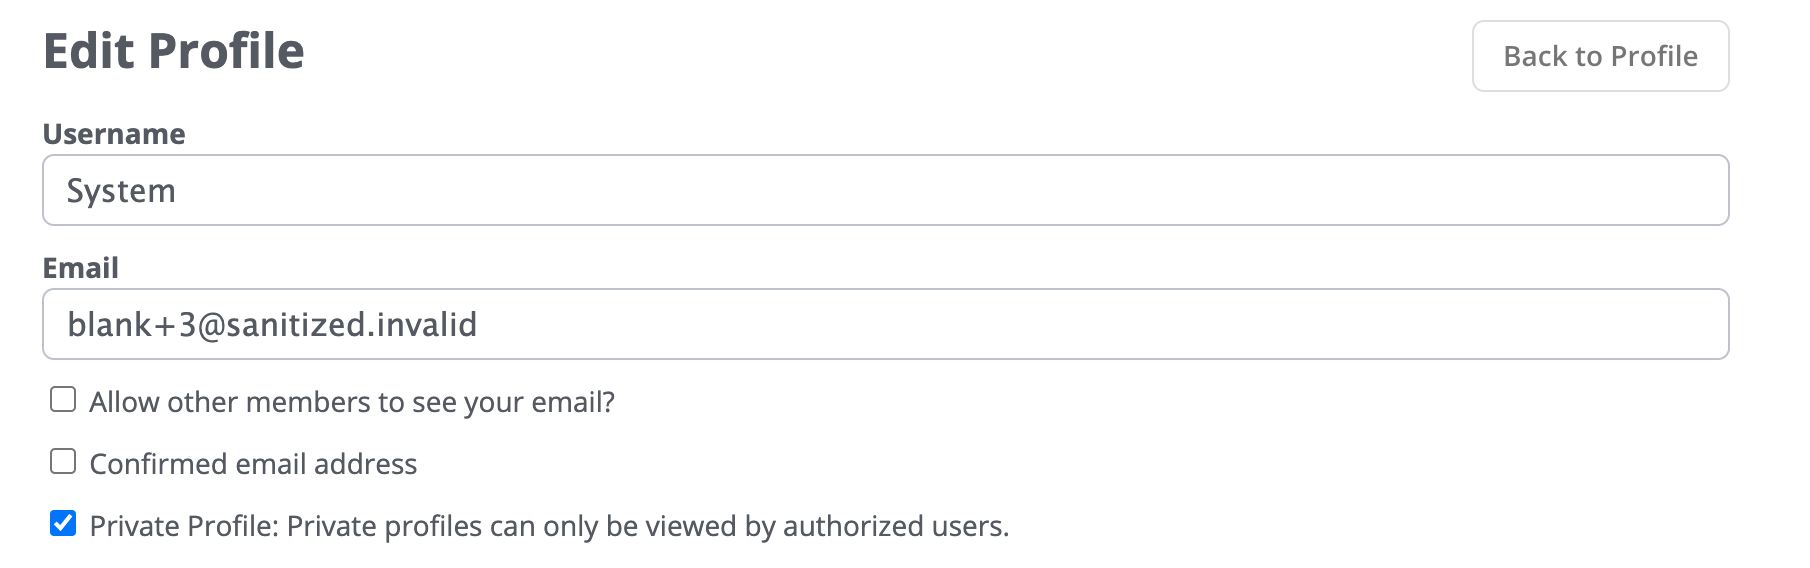 New Private Profile setting on user profiles